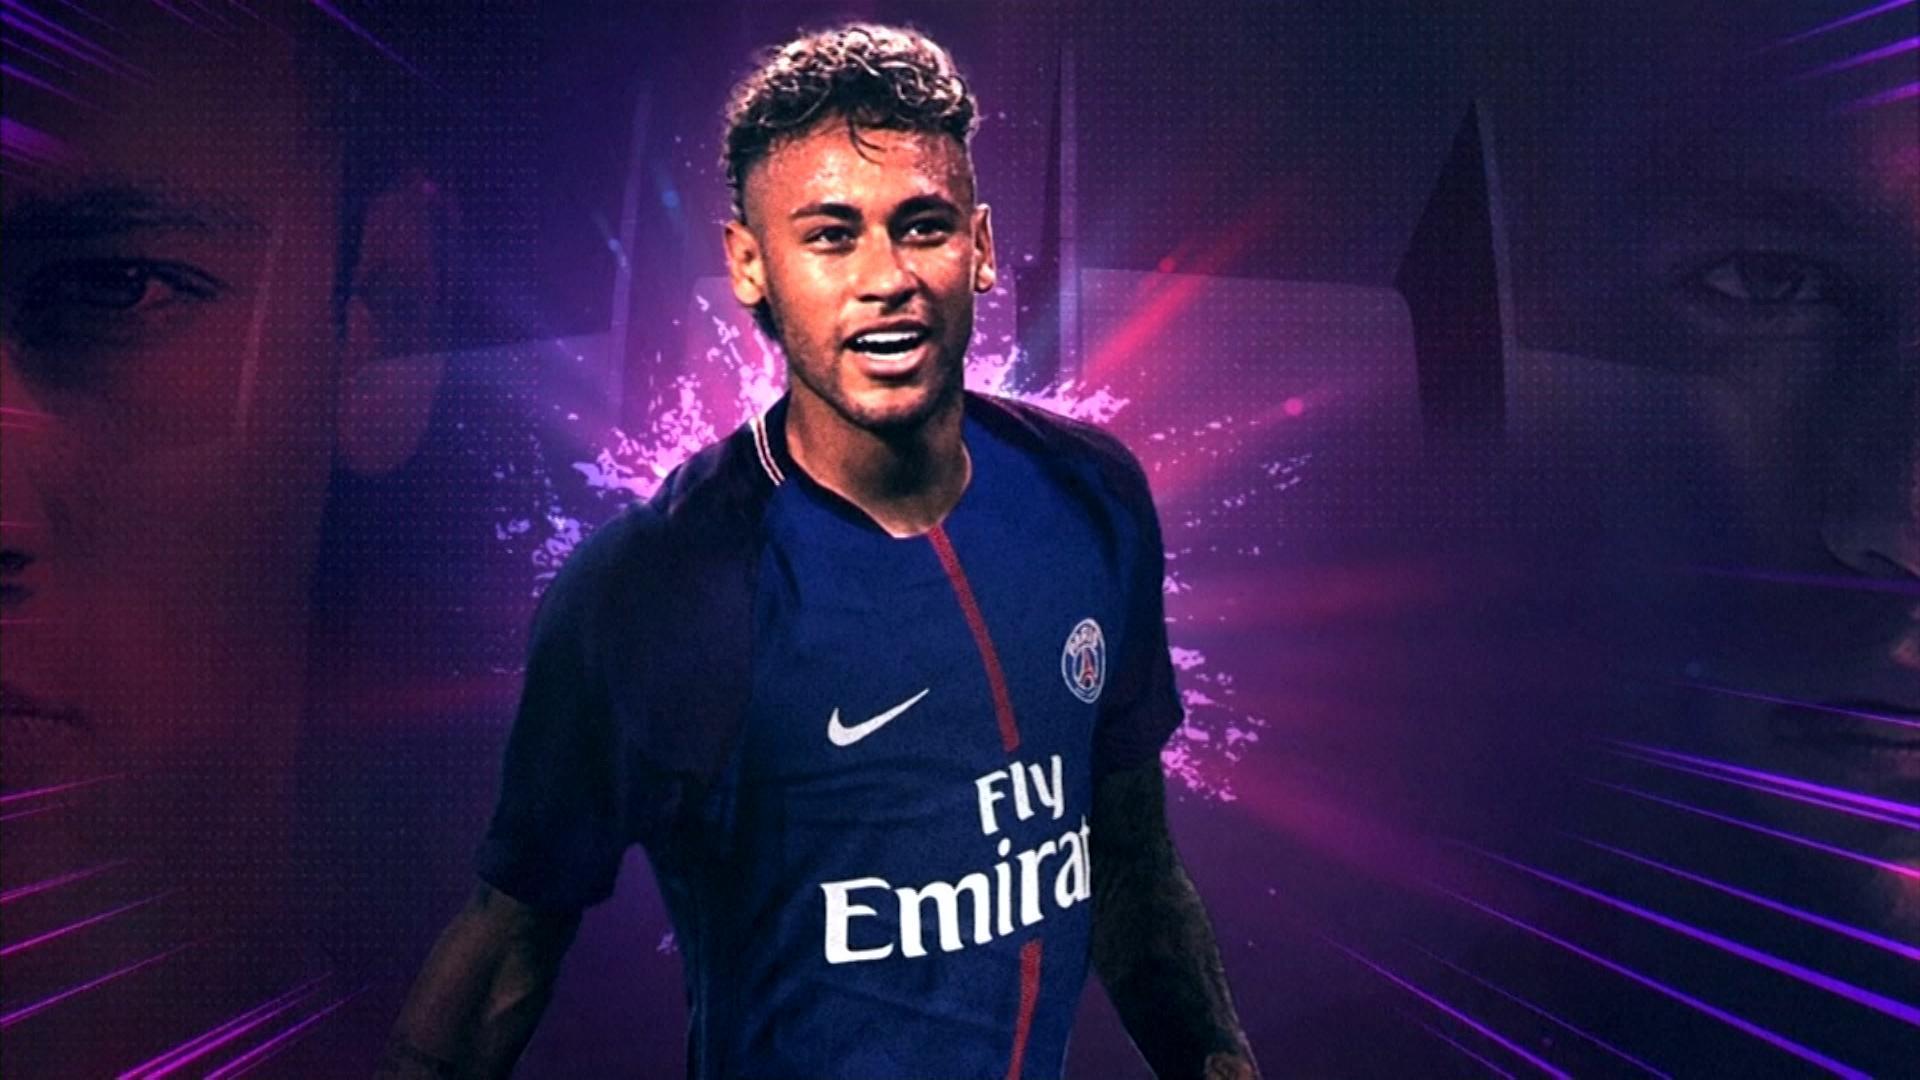 98+] Neymar PSG Wallpapers on WallpaperSafari